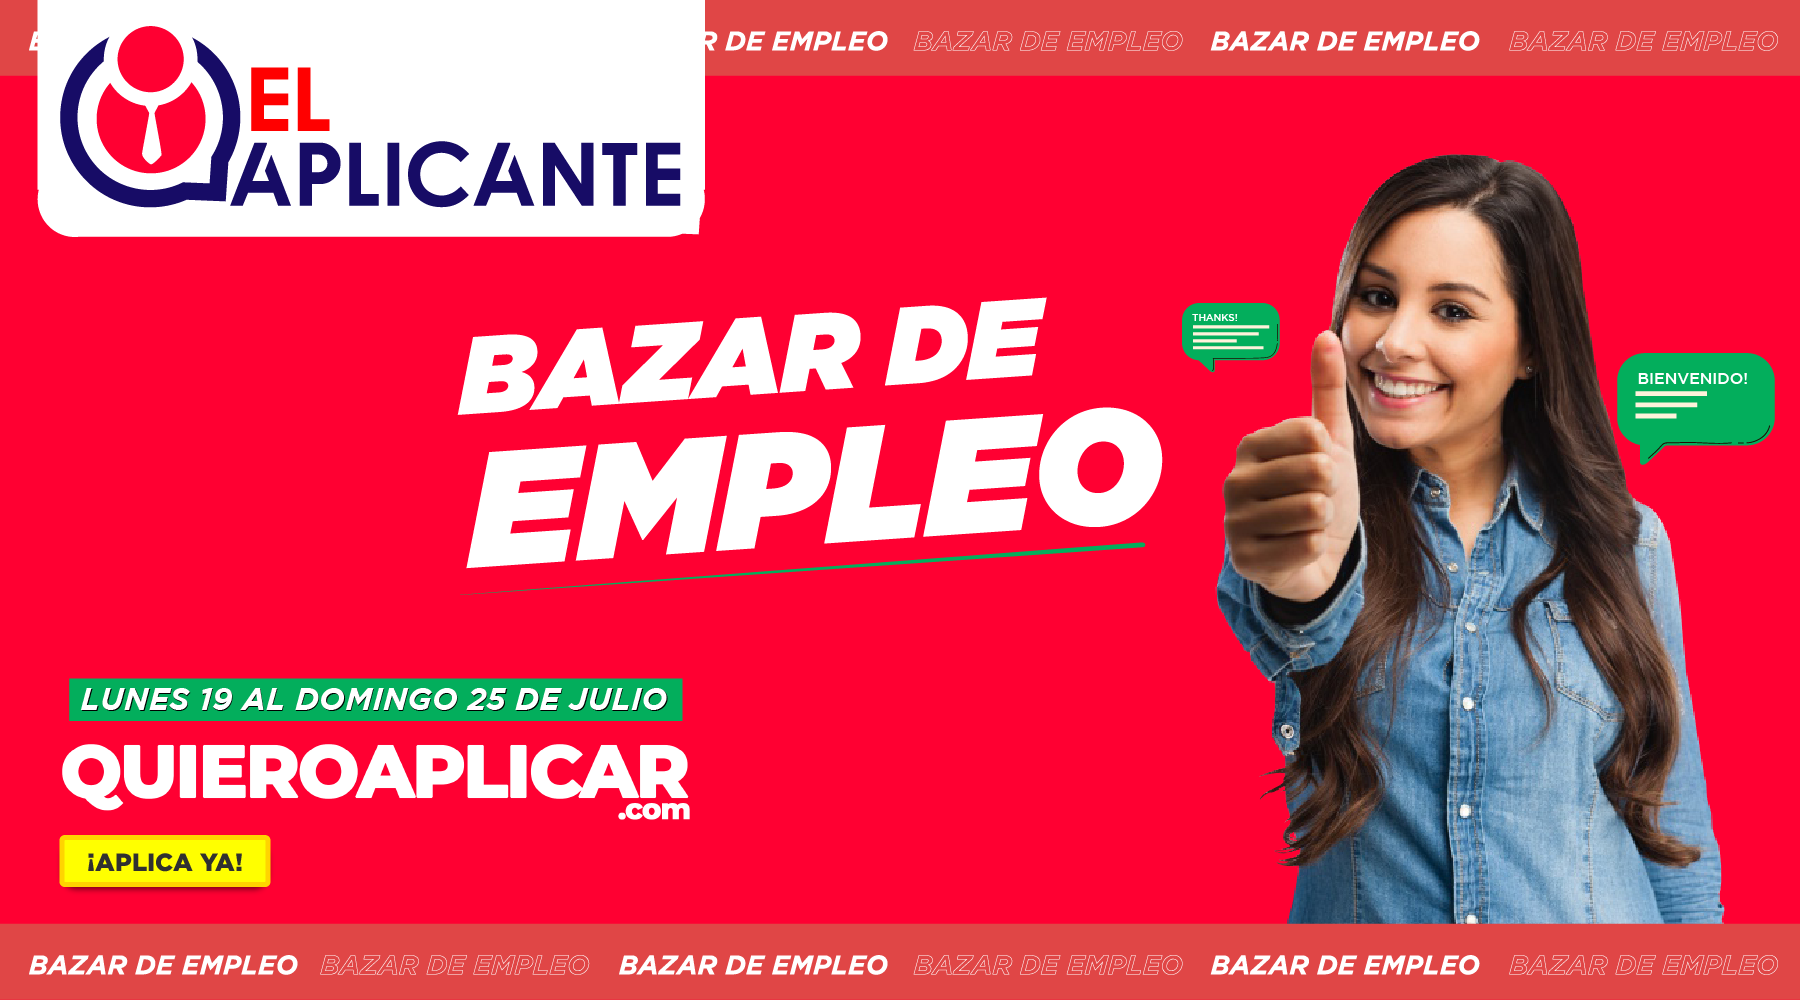 Bazar de_empleo_Quieroaplicar.com _Elaplicante